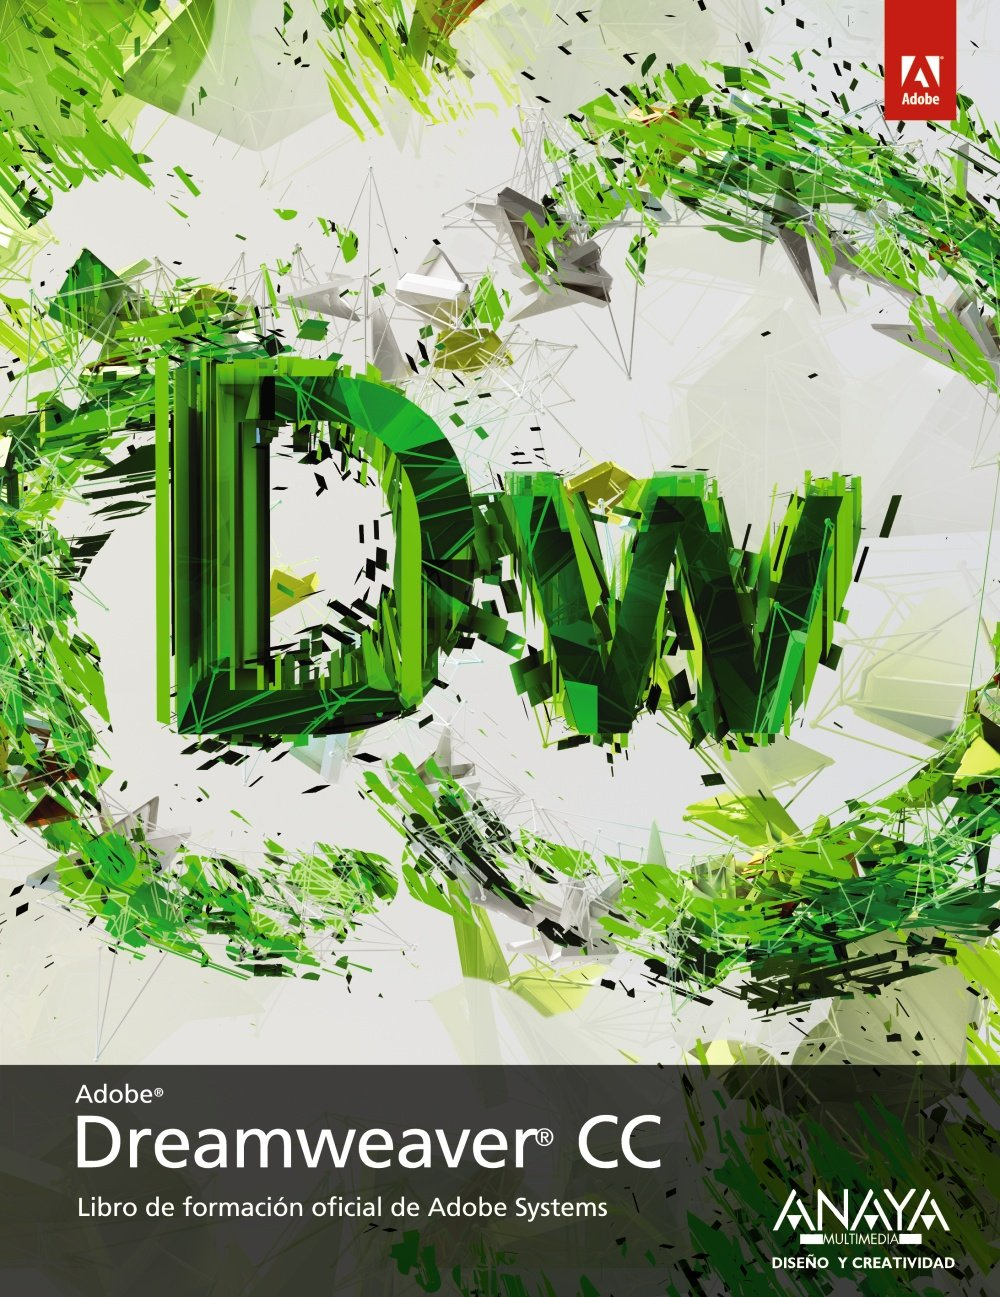 Adobe Dreamweaver 2020 v20.1.0.15211 poster box cover